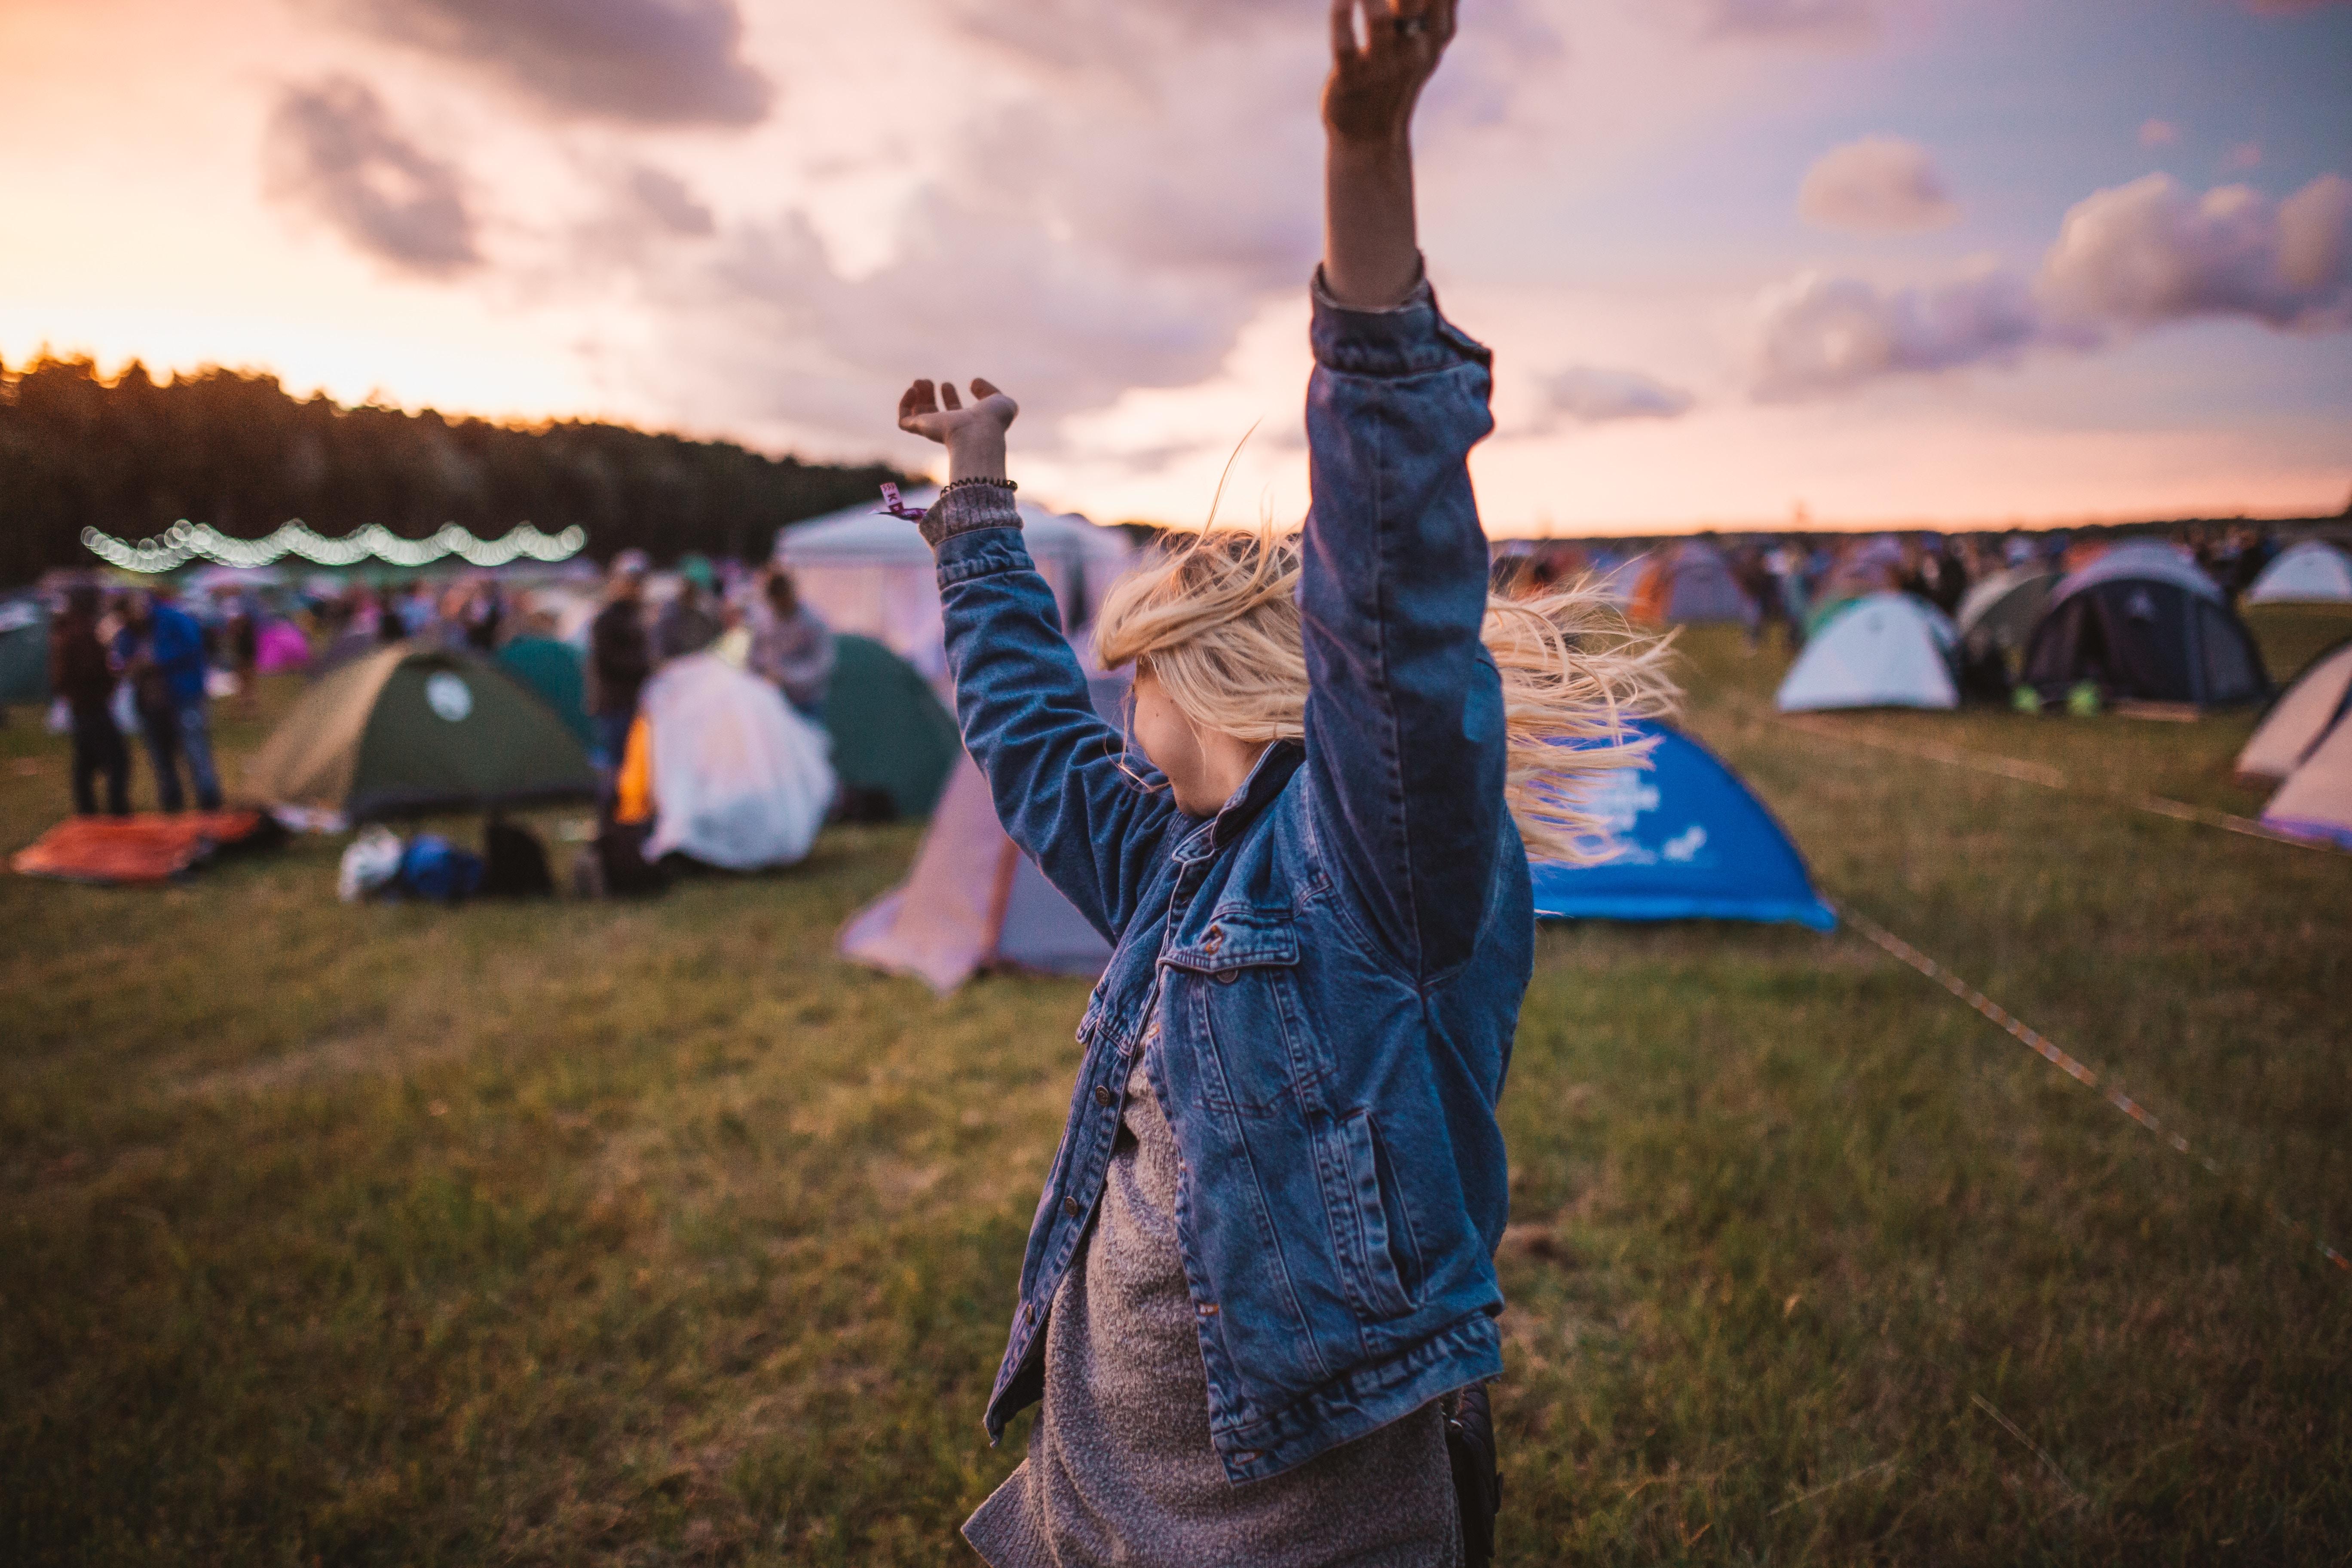 Top Music Festivals in the U.S. Summer 2019